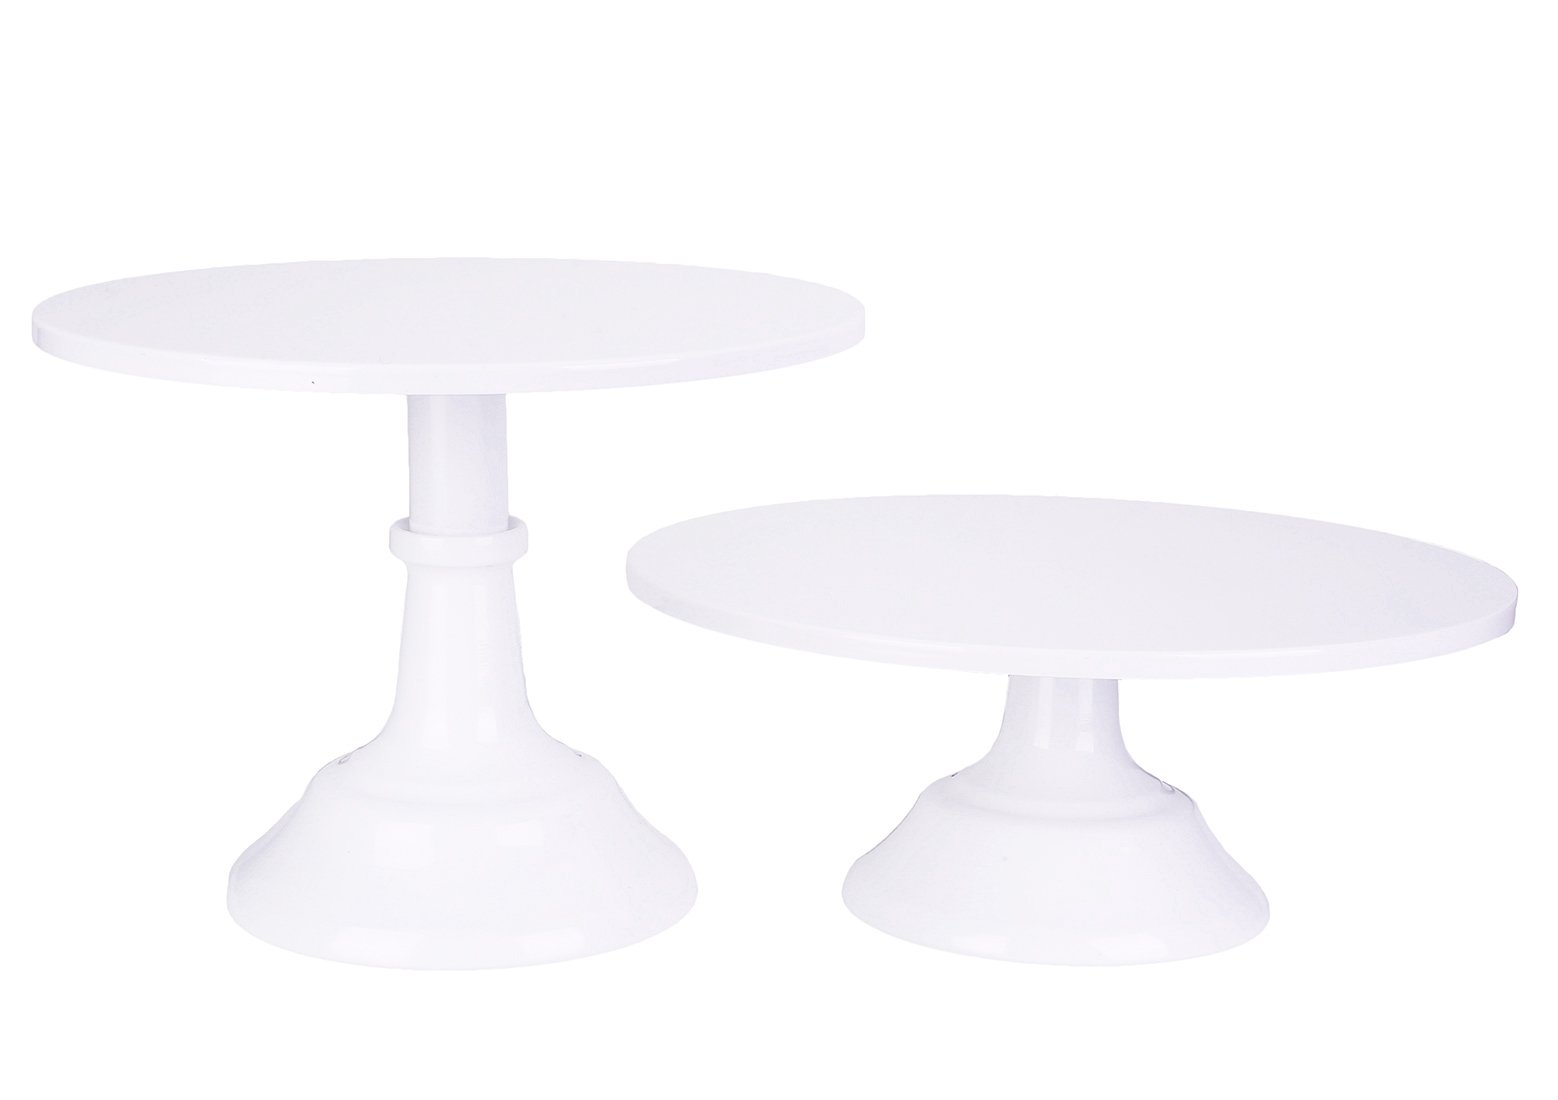 VILAVITA 2-Set Modern Cake Stands Round Cake Stand Cupcake Stands for Baby Shower, Wedding Birthday Party Celebration, White